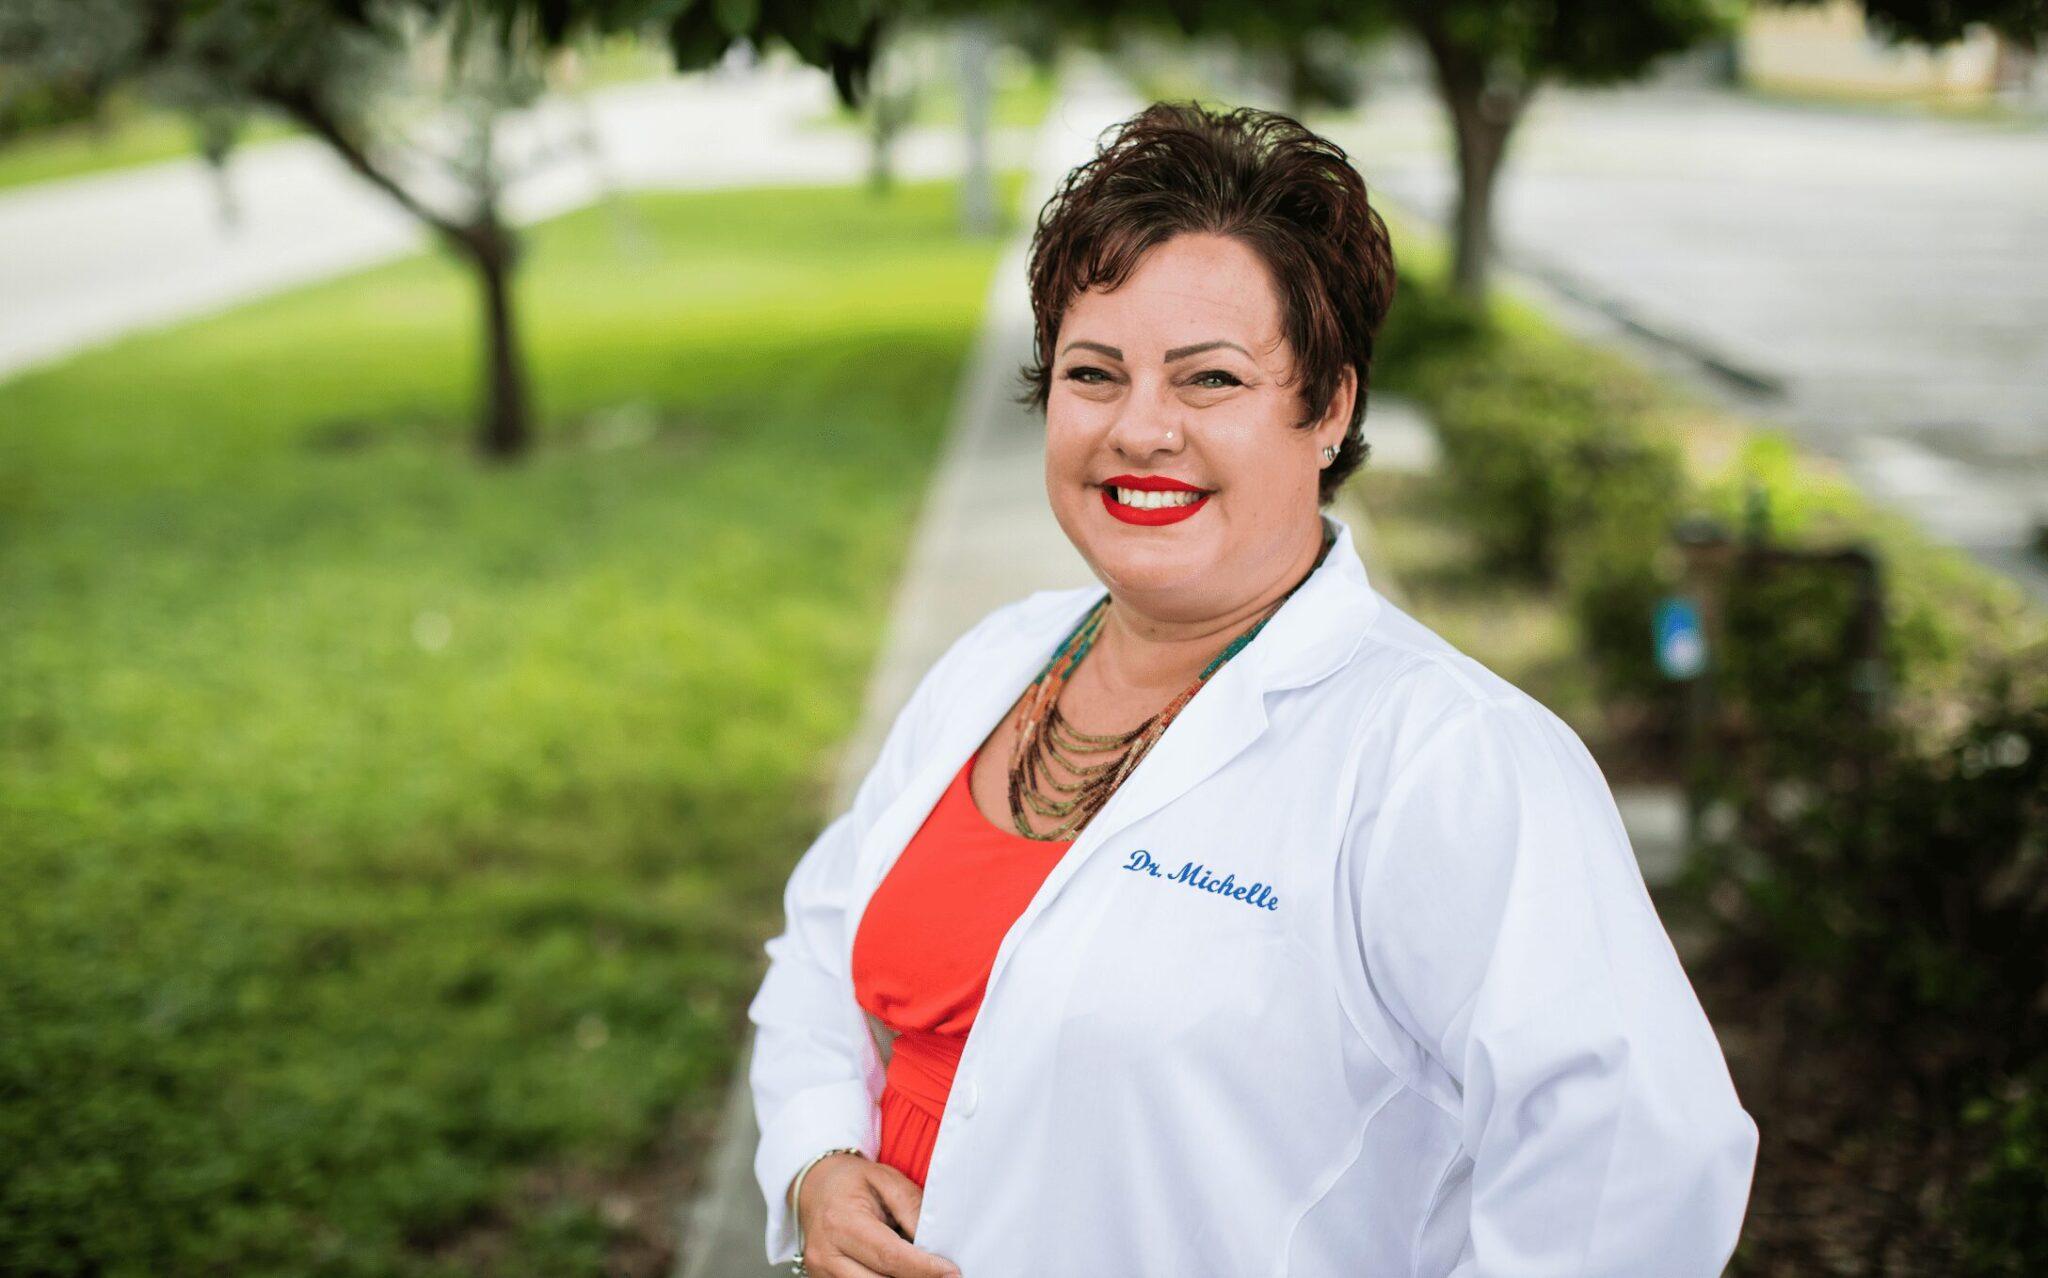 Dr. Michelle smiling